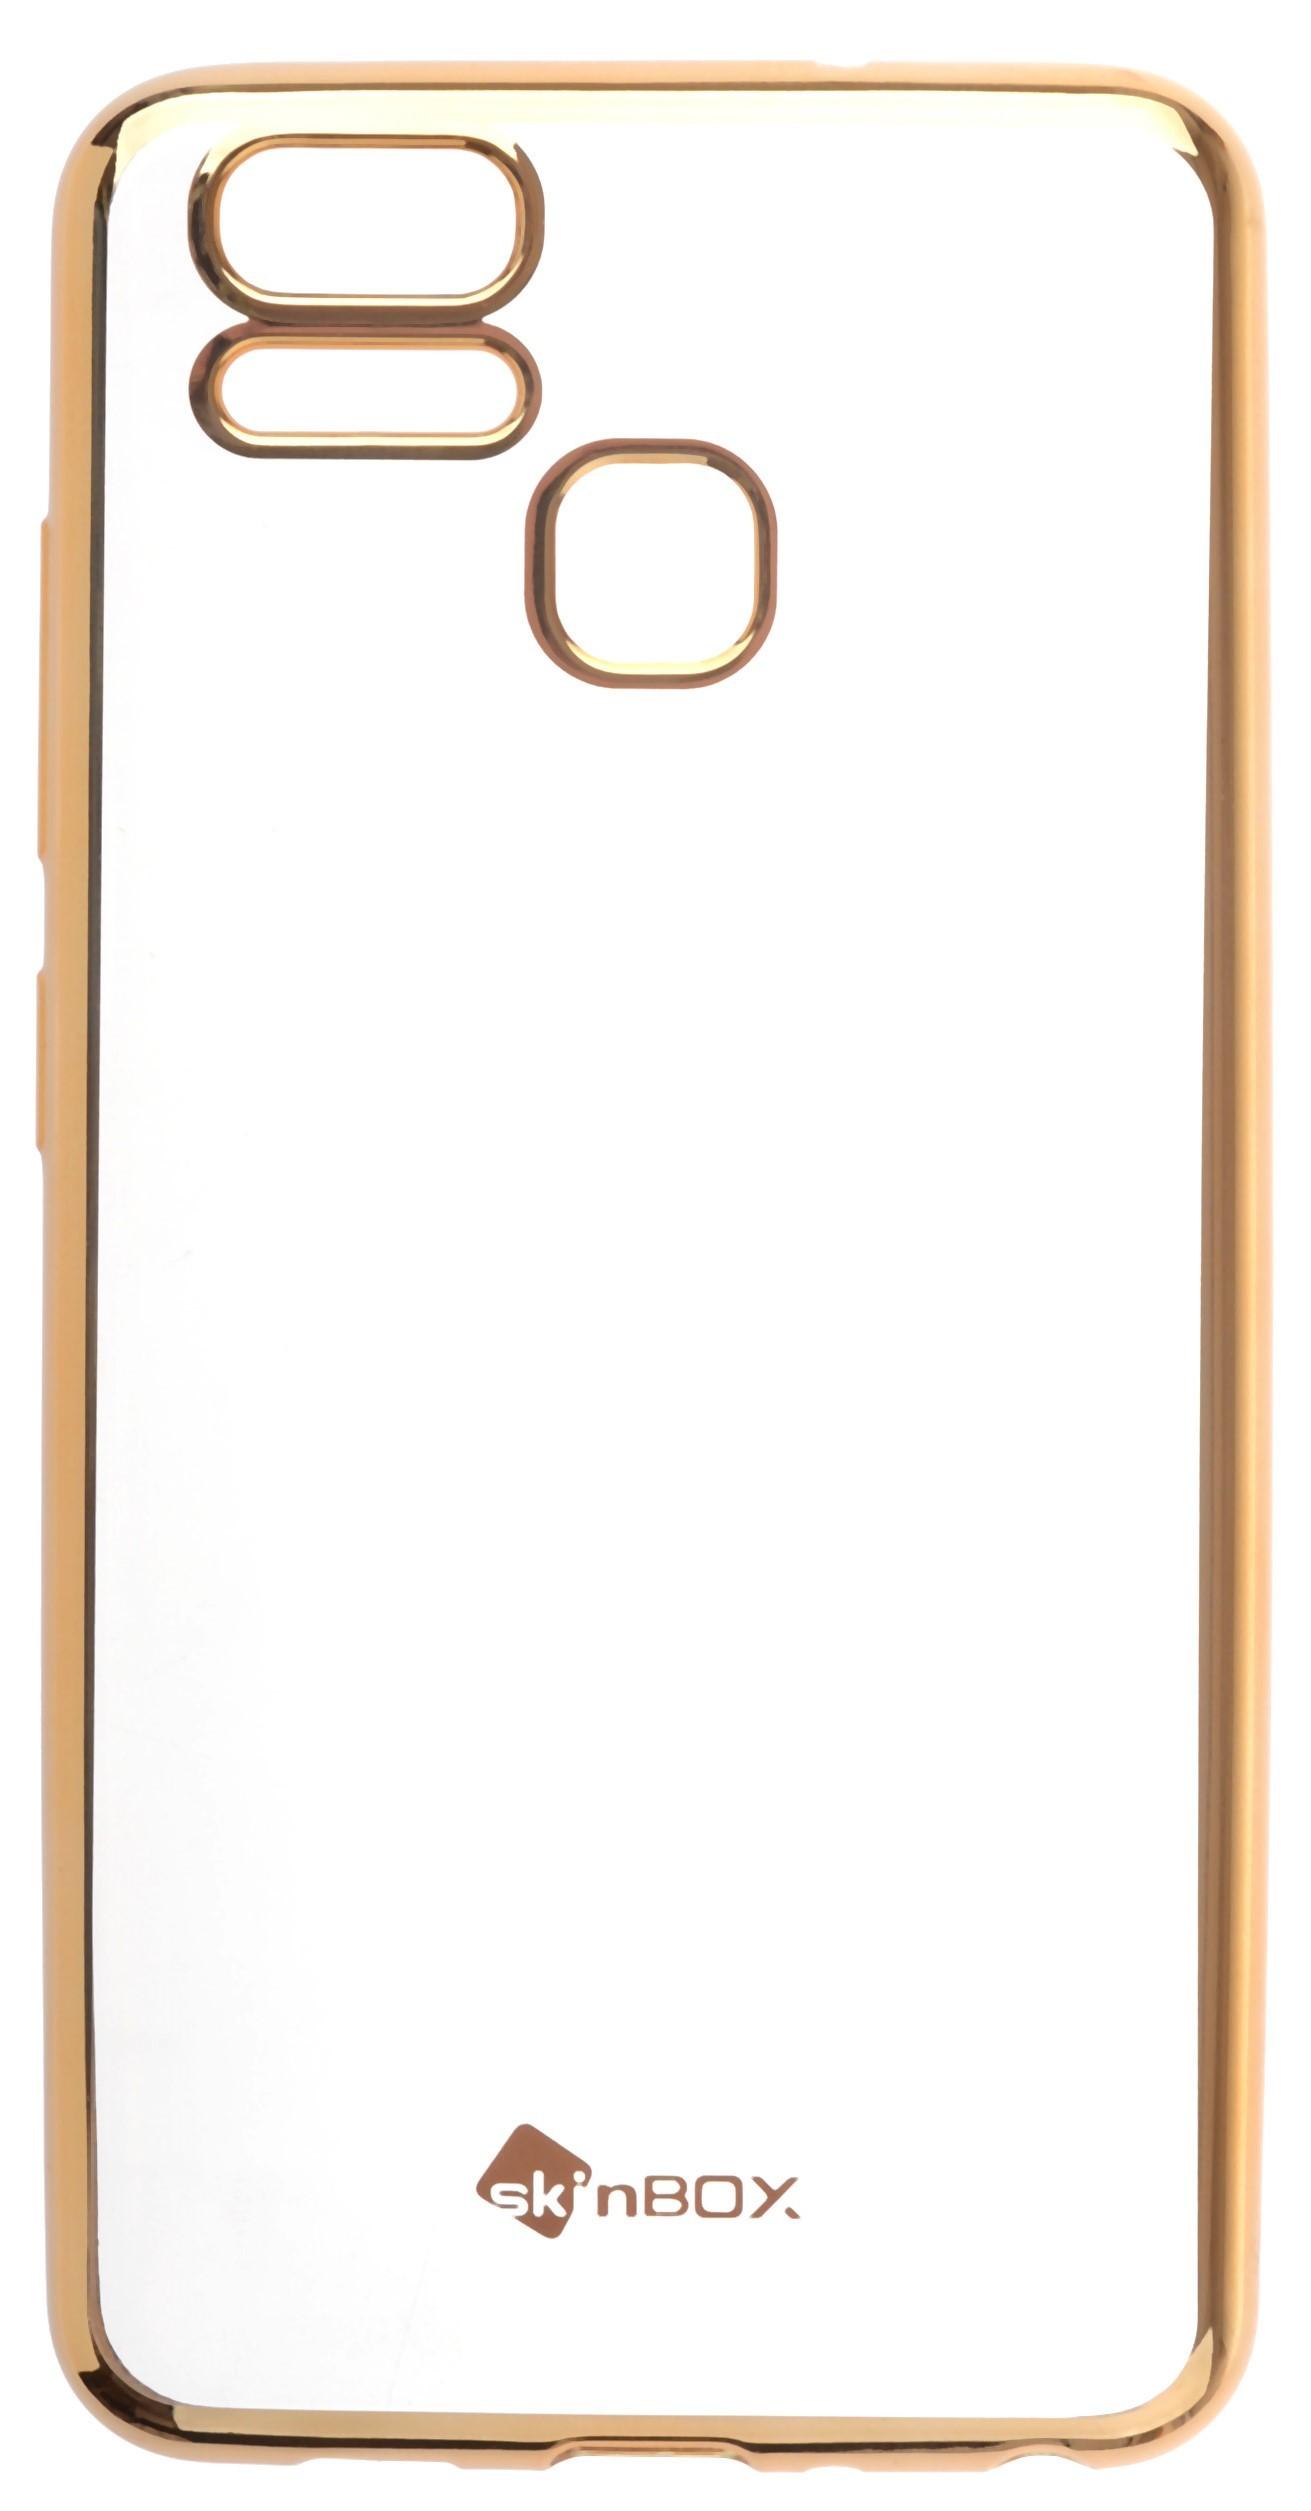 Чехол для сотового телефона skinBOX Silicone chrome border, 4630042524453, золотой skinbox 4people slim silicone чехол накладка для xiaomi redmi 4a transparent